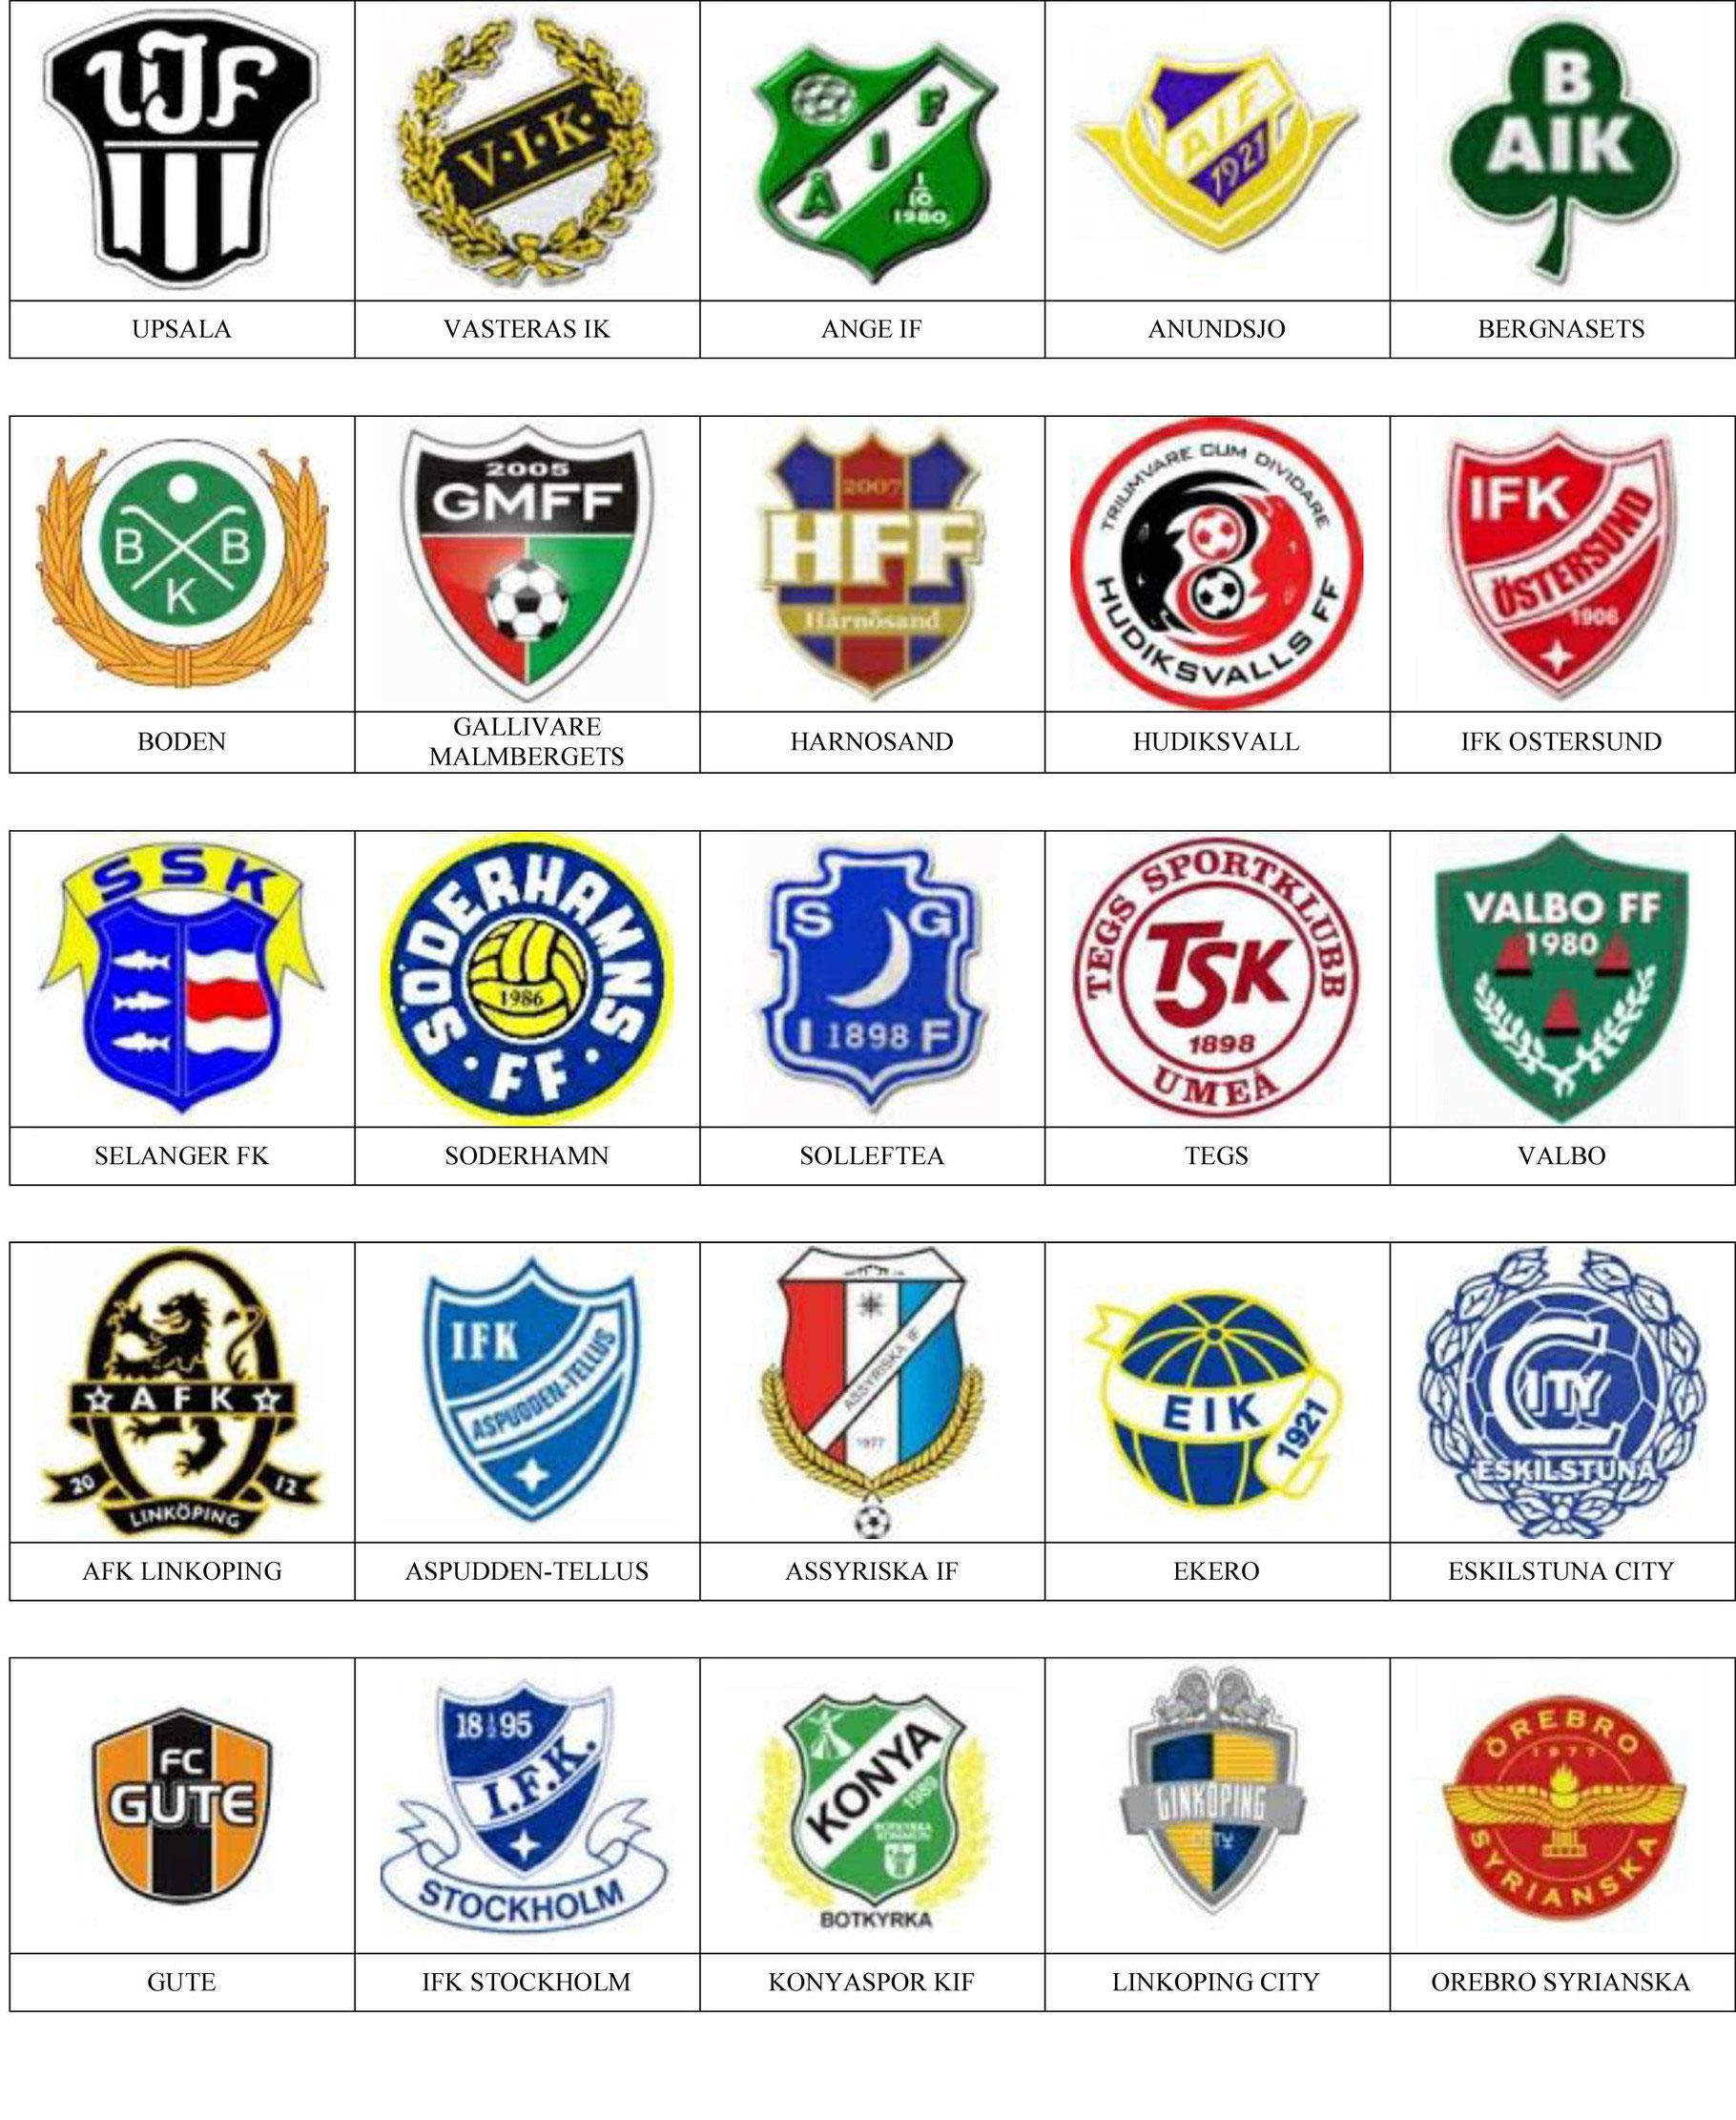 ea069f09fd1e4 Suecia - Pins de escudos insiginas de equipos de fútbol.